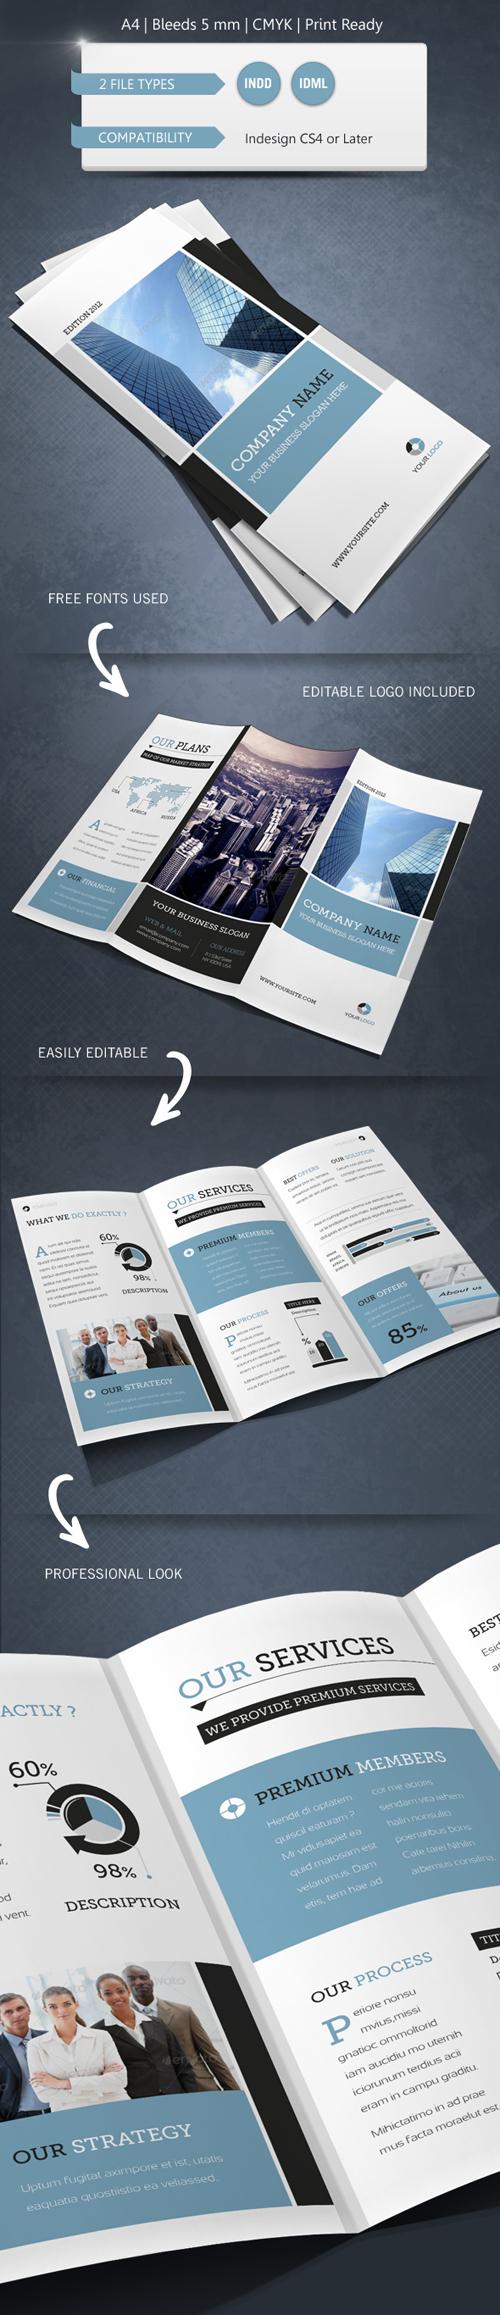 Modern Business Trifold Brochure